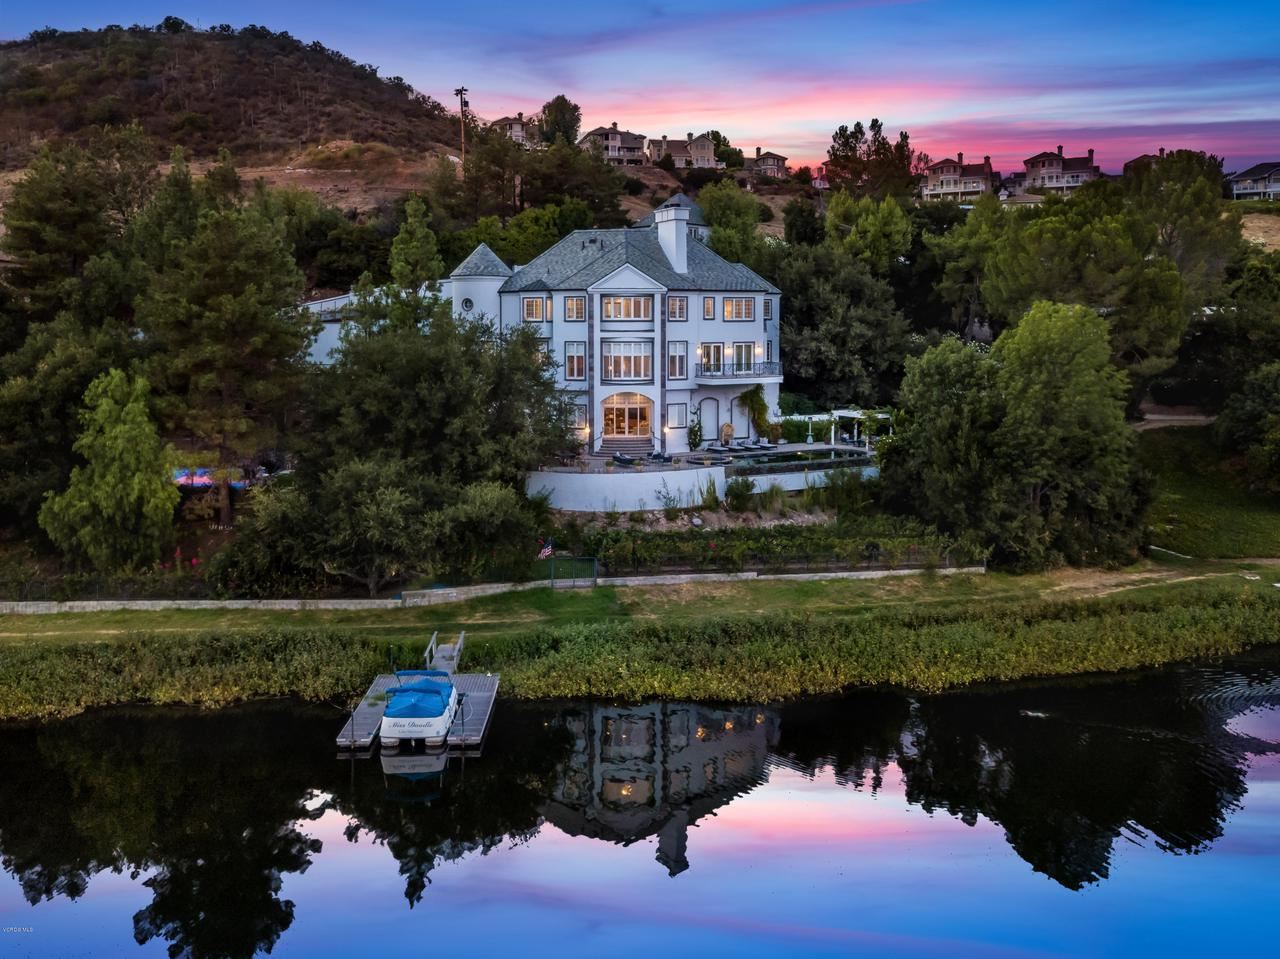 474 LAKE SHERWOOD Drive, Lake Sherwood, CA 91361 - #: 219011250